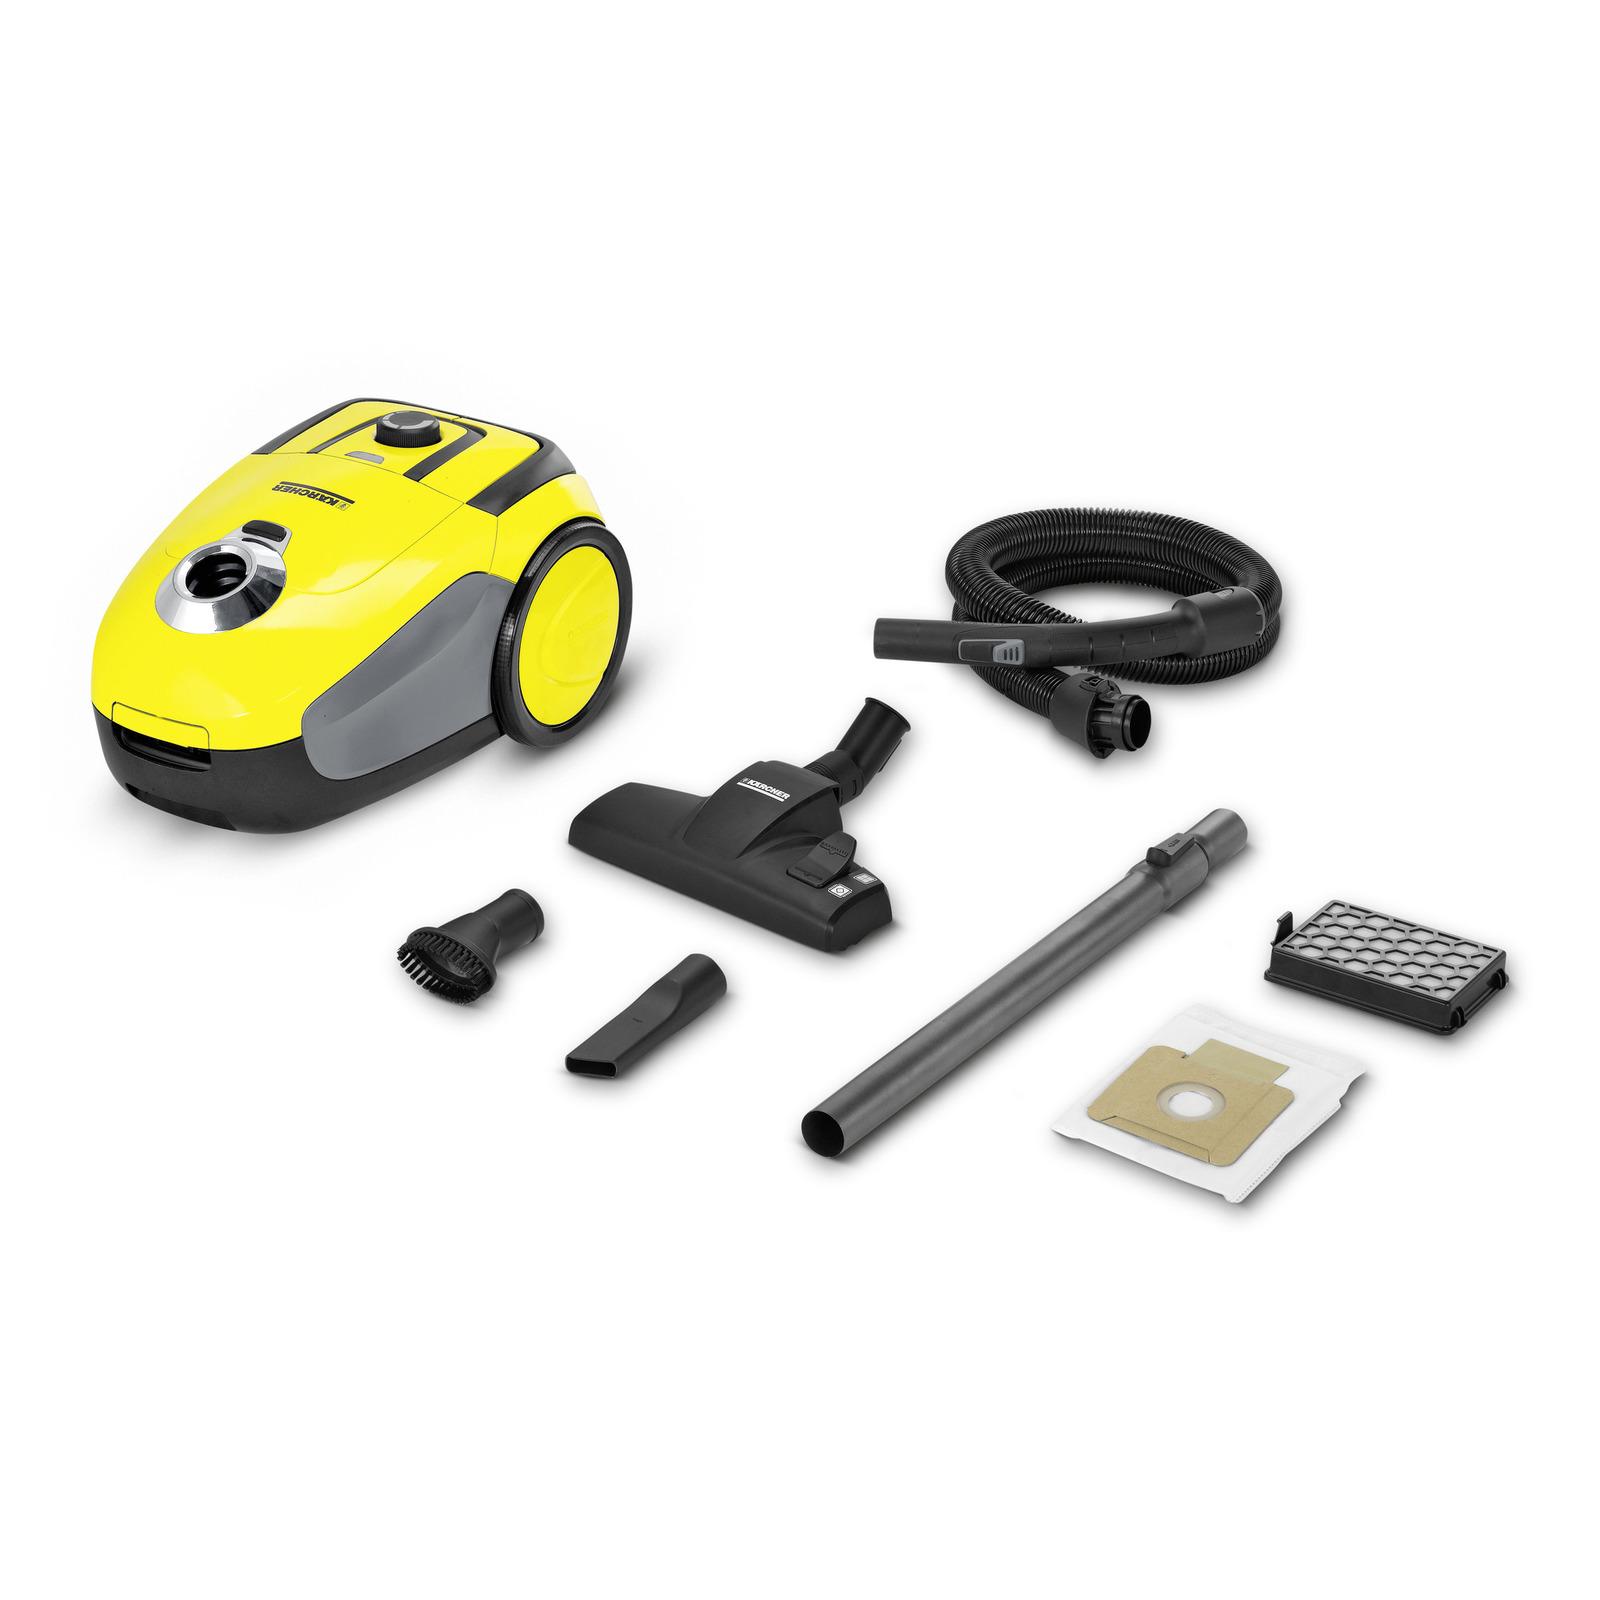 KARCHER 1.198-109.0 - VC2 Vacuum Cleaner